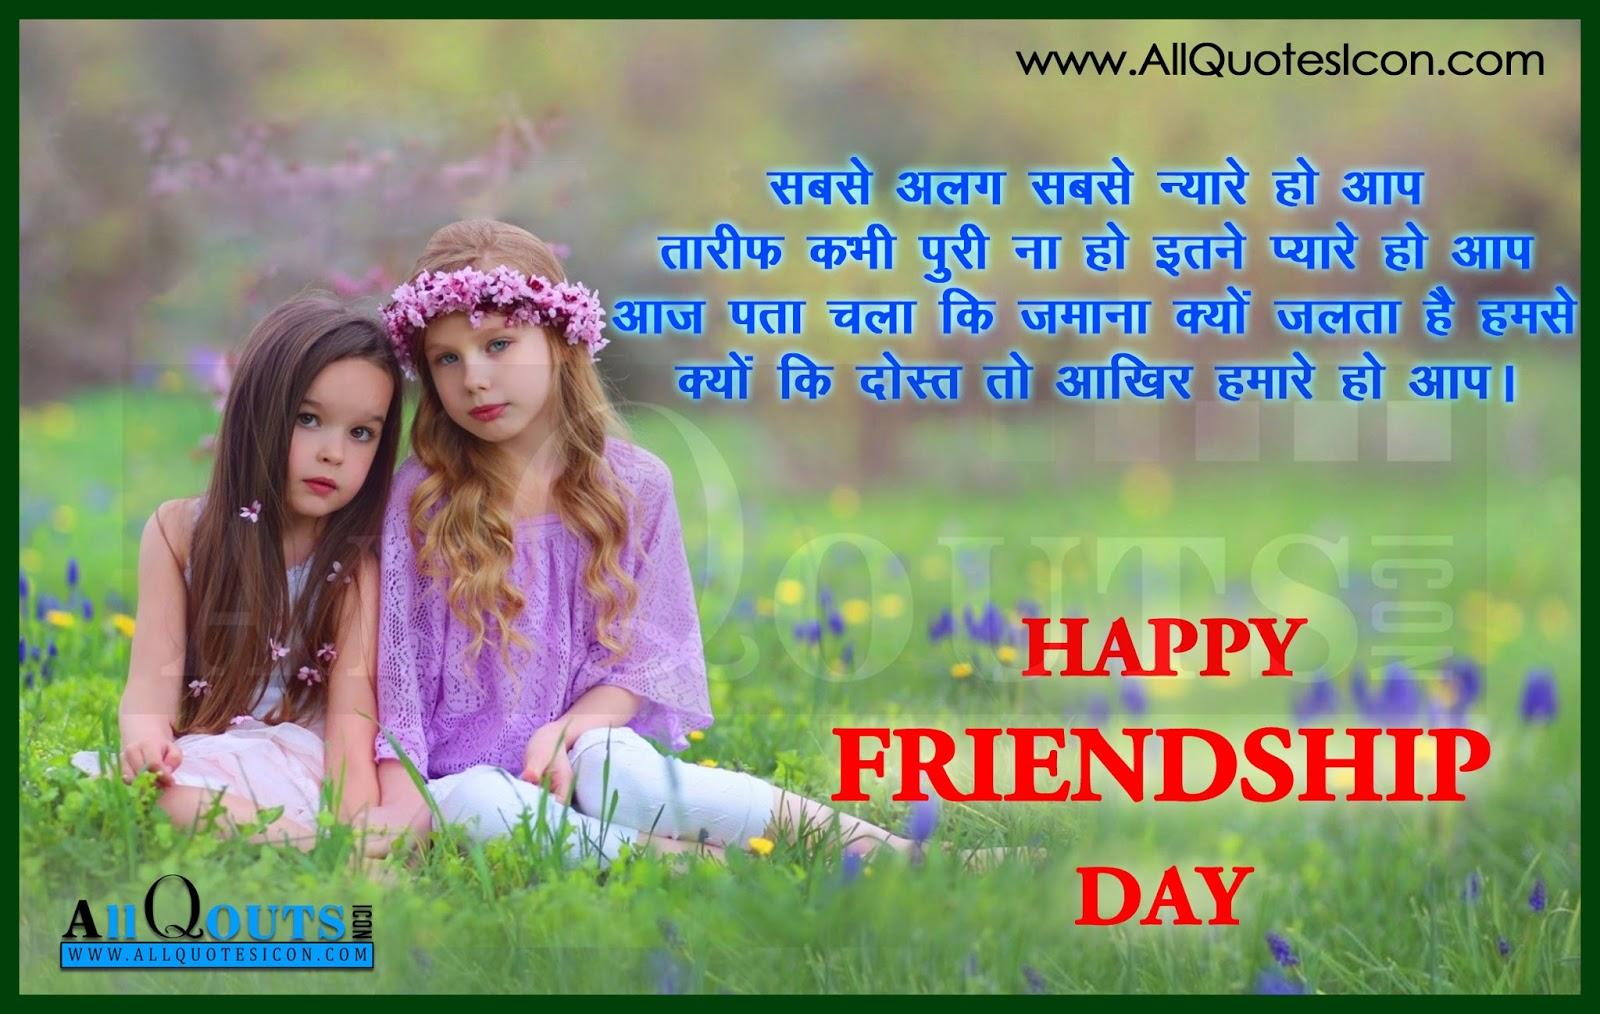 Friendship Day Shayari And Images Hd Wallpapers Best Inspiraitonal